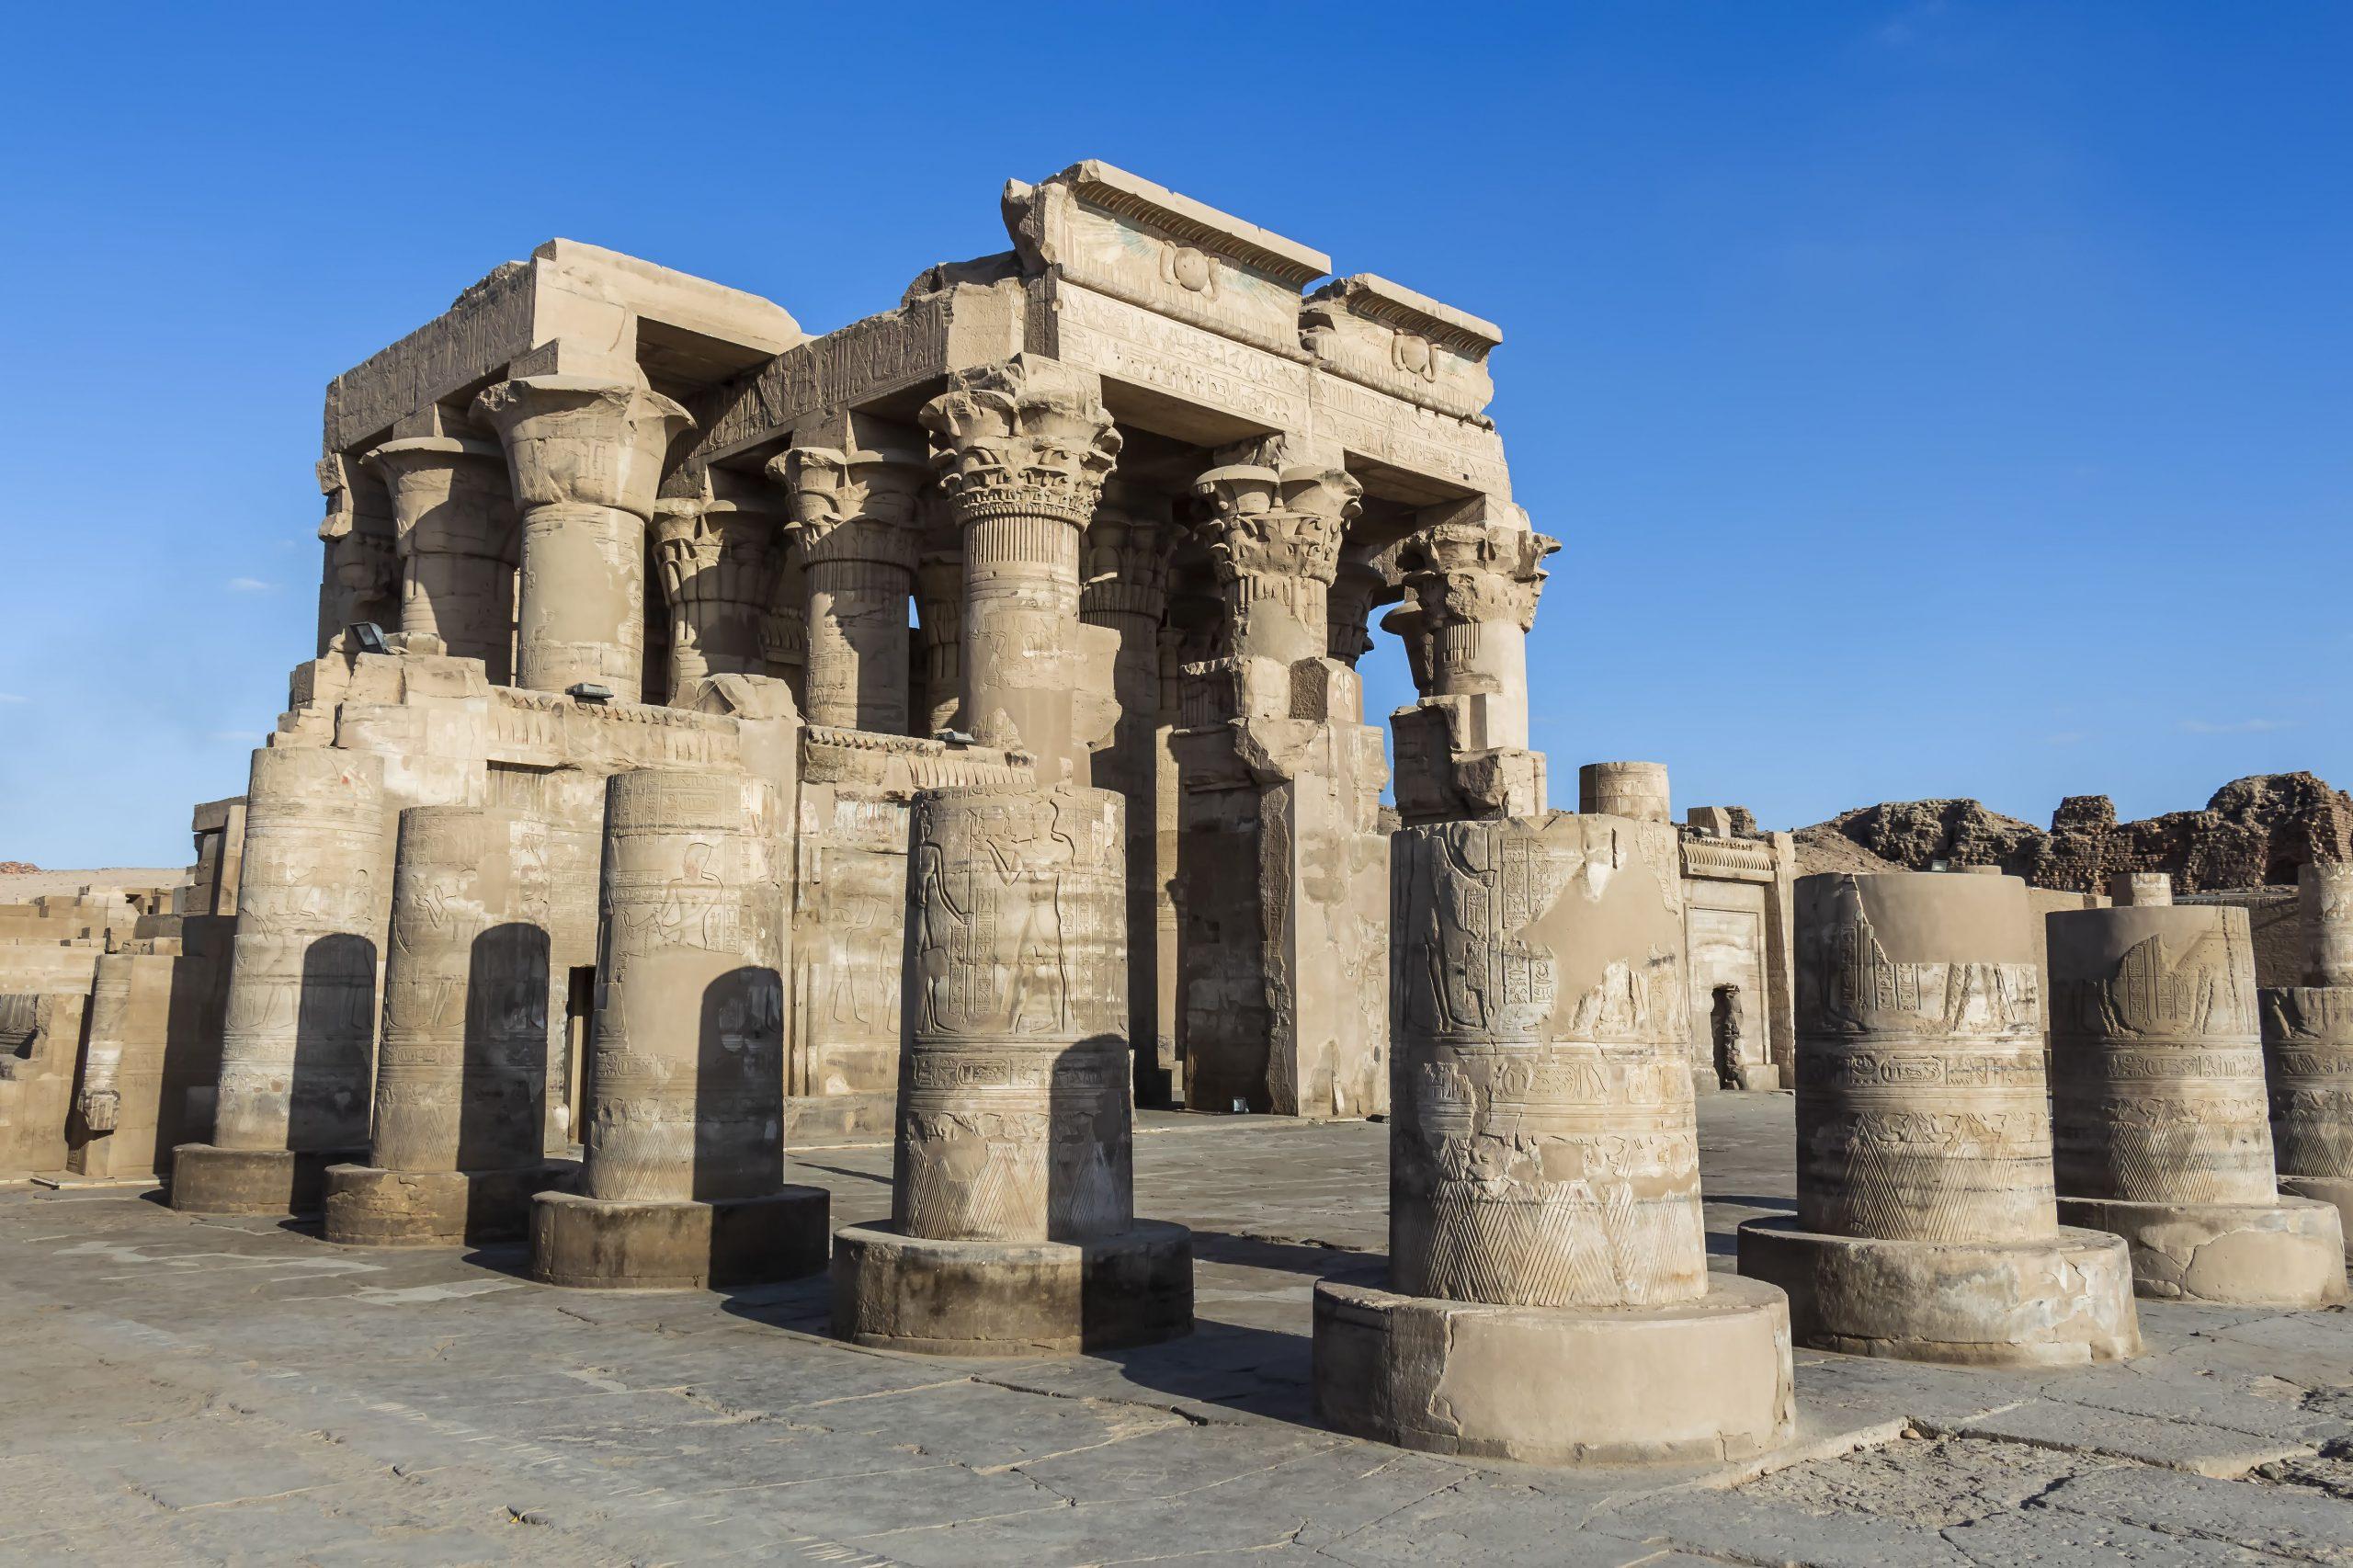 Aswan To Luxor Train